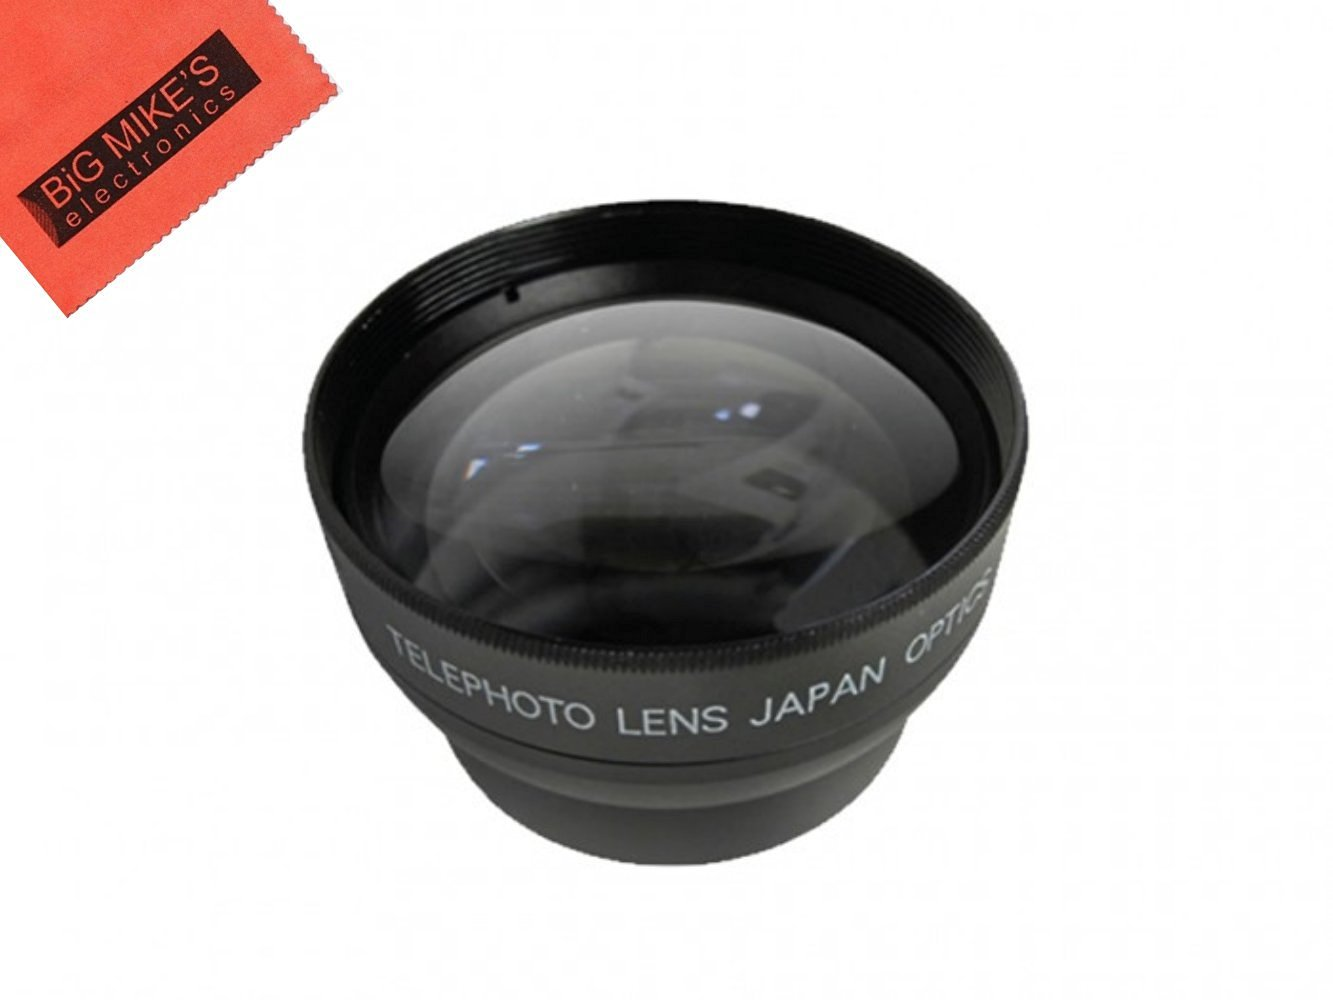 Buy 46mm 22x Telephoto Lens For Panasonic Lumix G Vario 35 100mm F Leica Dg Summilux 25mm 14 Asph Micro 4 3 40 56 Mega Ois X Pz 45 175mm Zoom